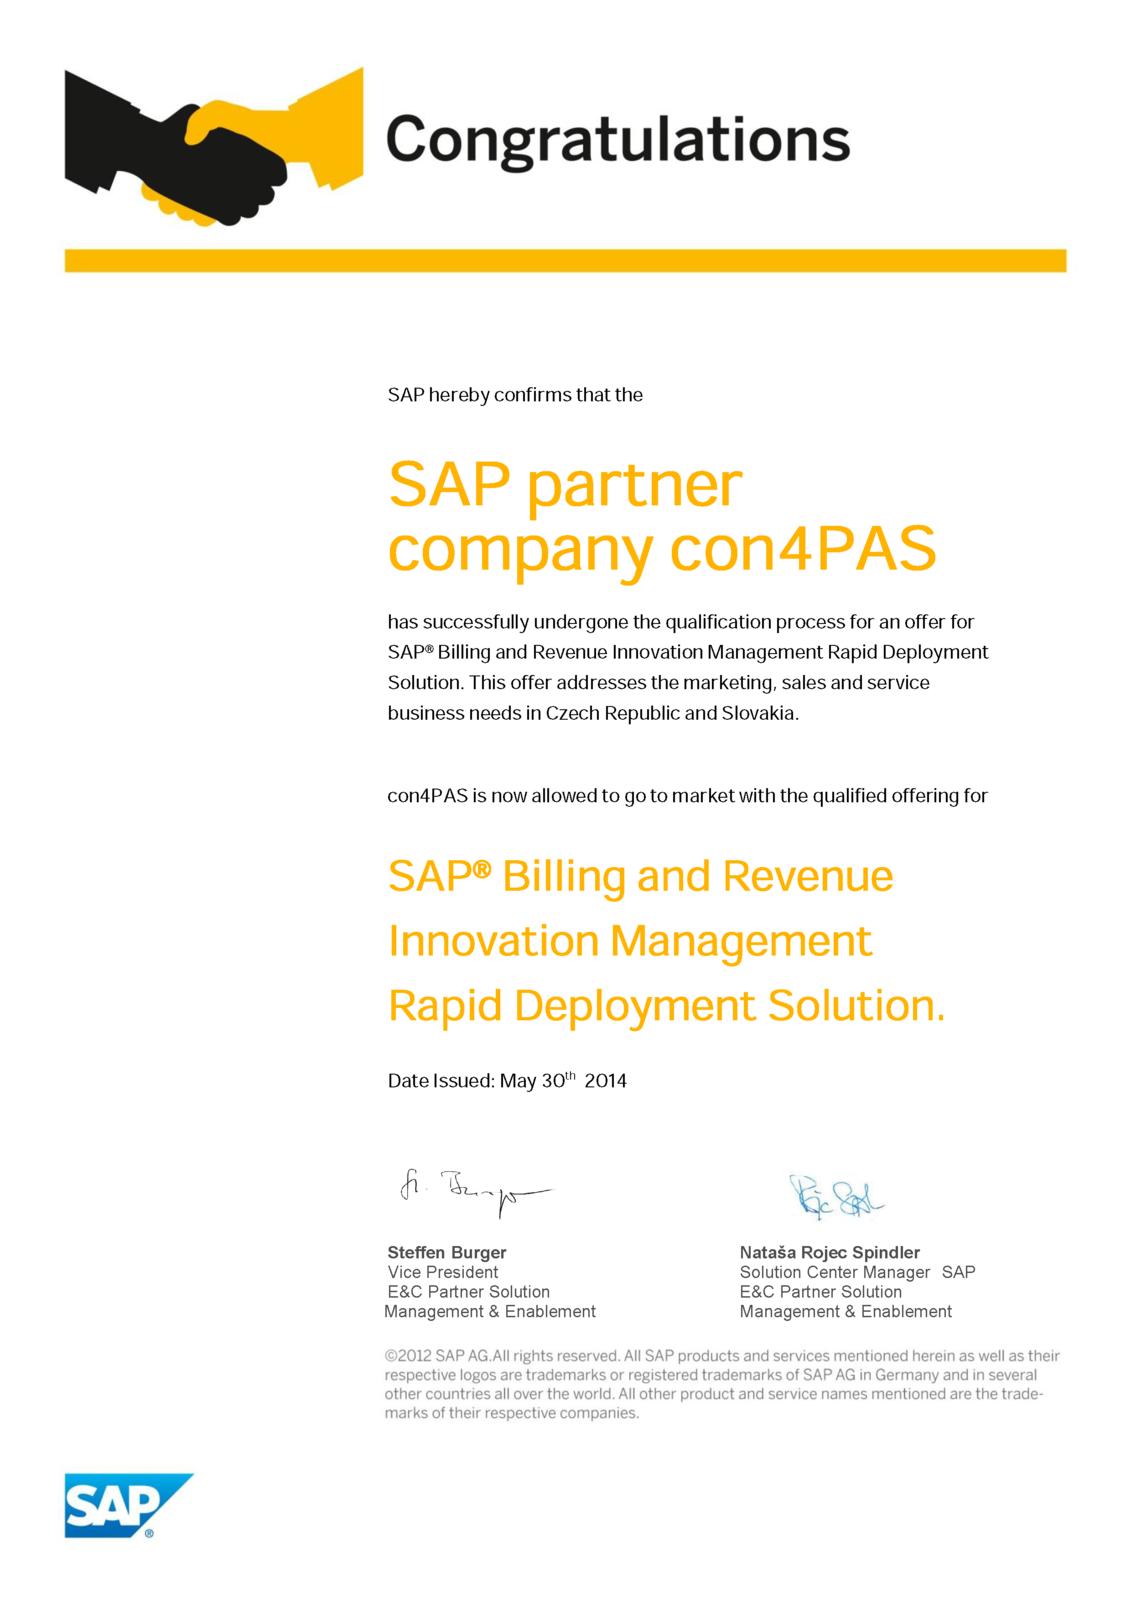 Certificates con4pas rds certificate for sap brim 1betcityfo Choice Image